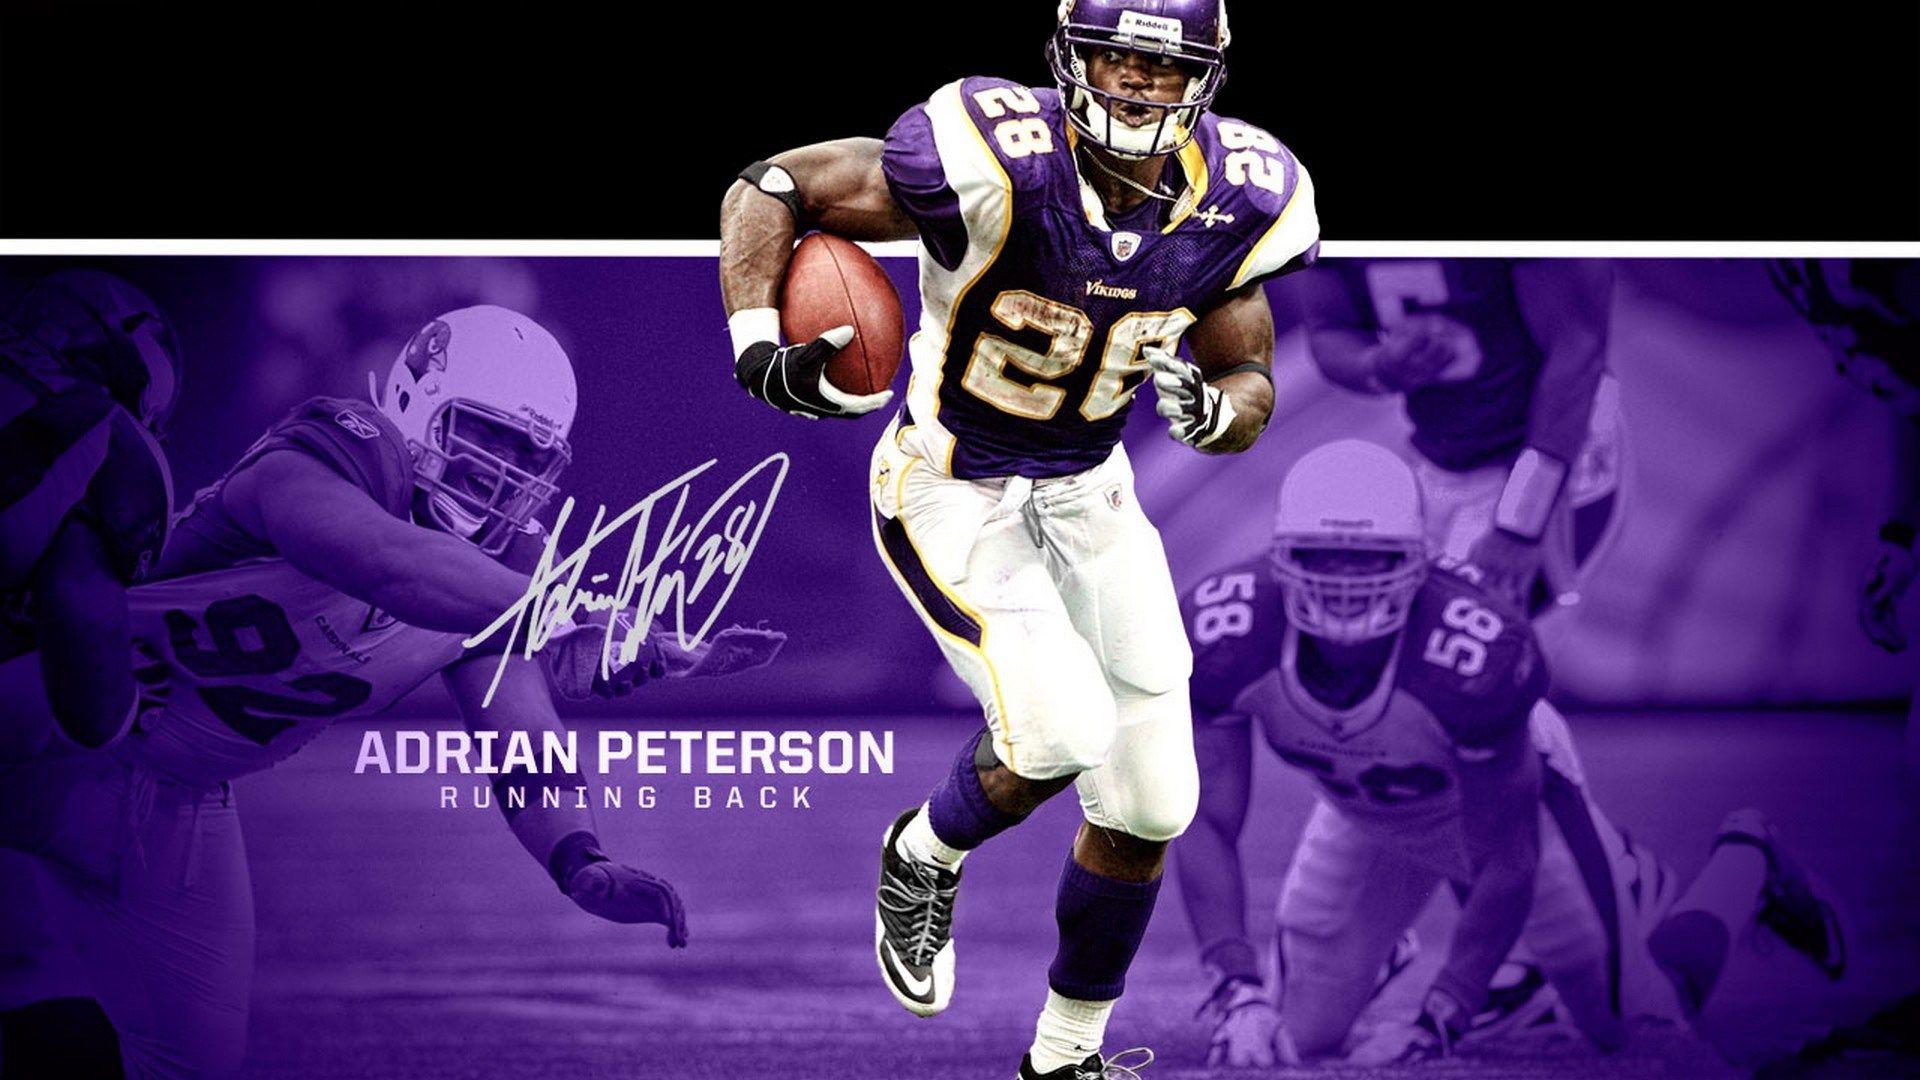 Free Hd Adrian Peterson Wallpaper